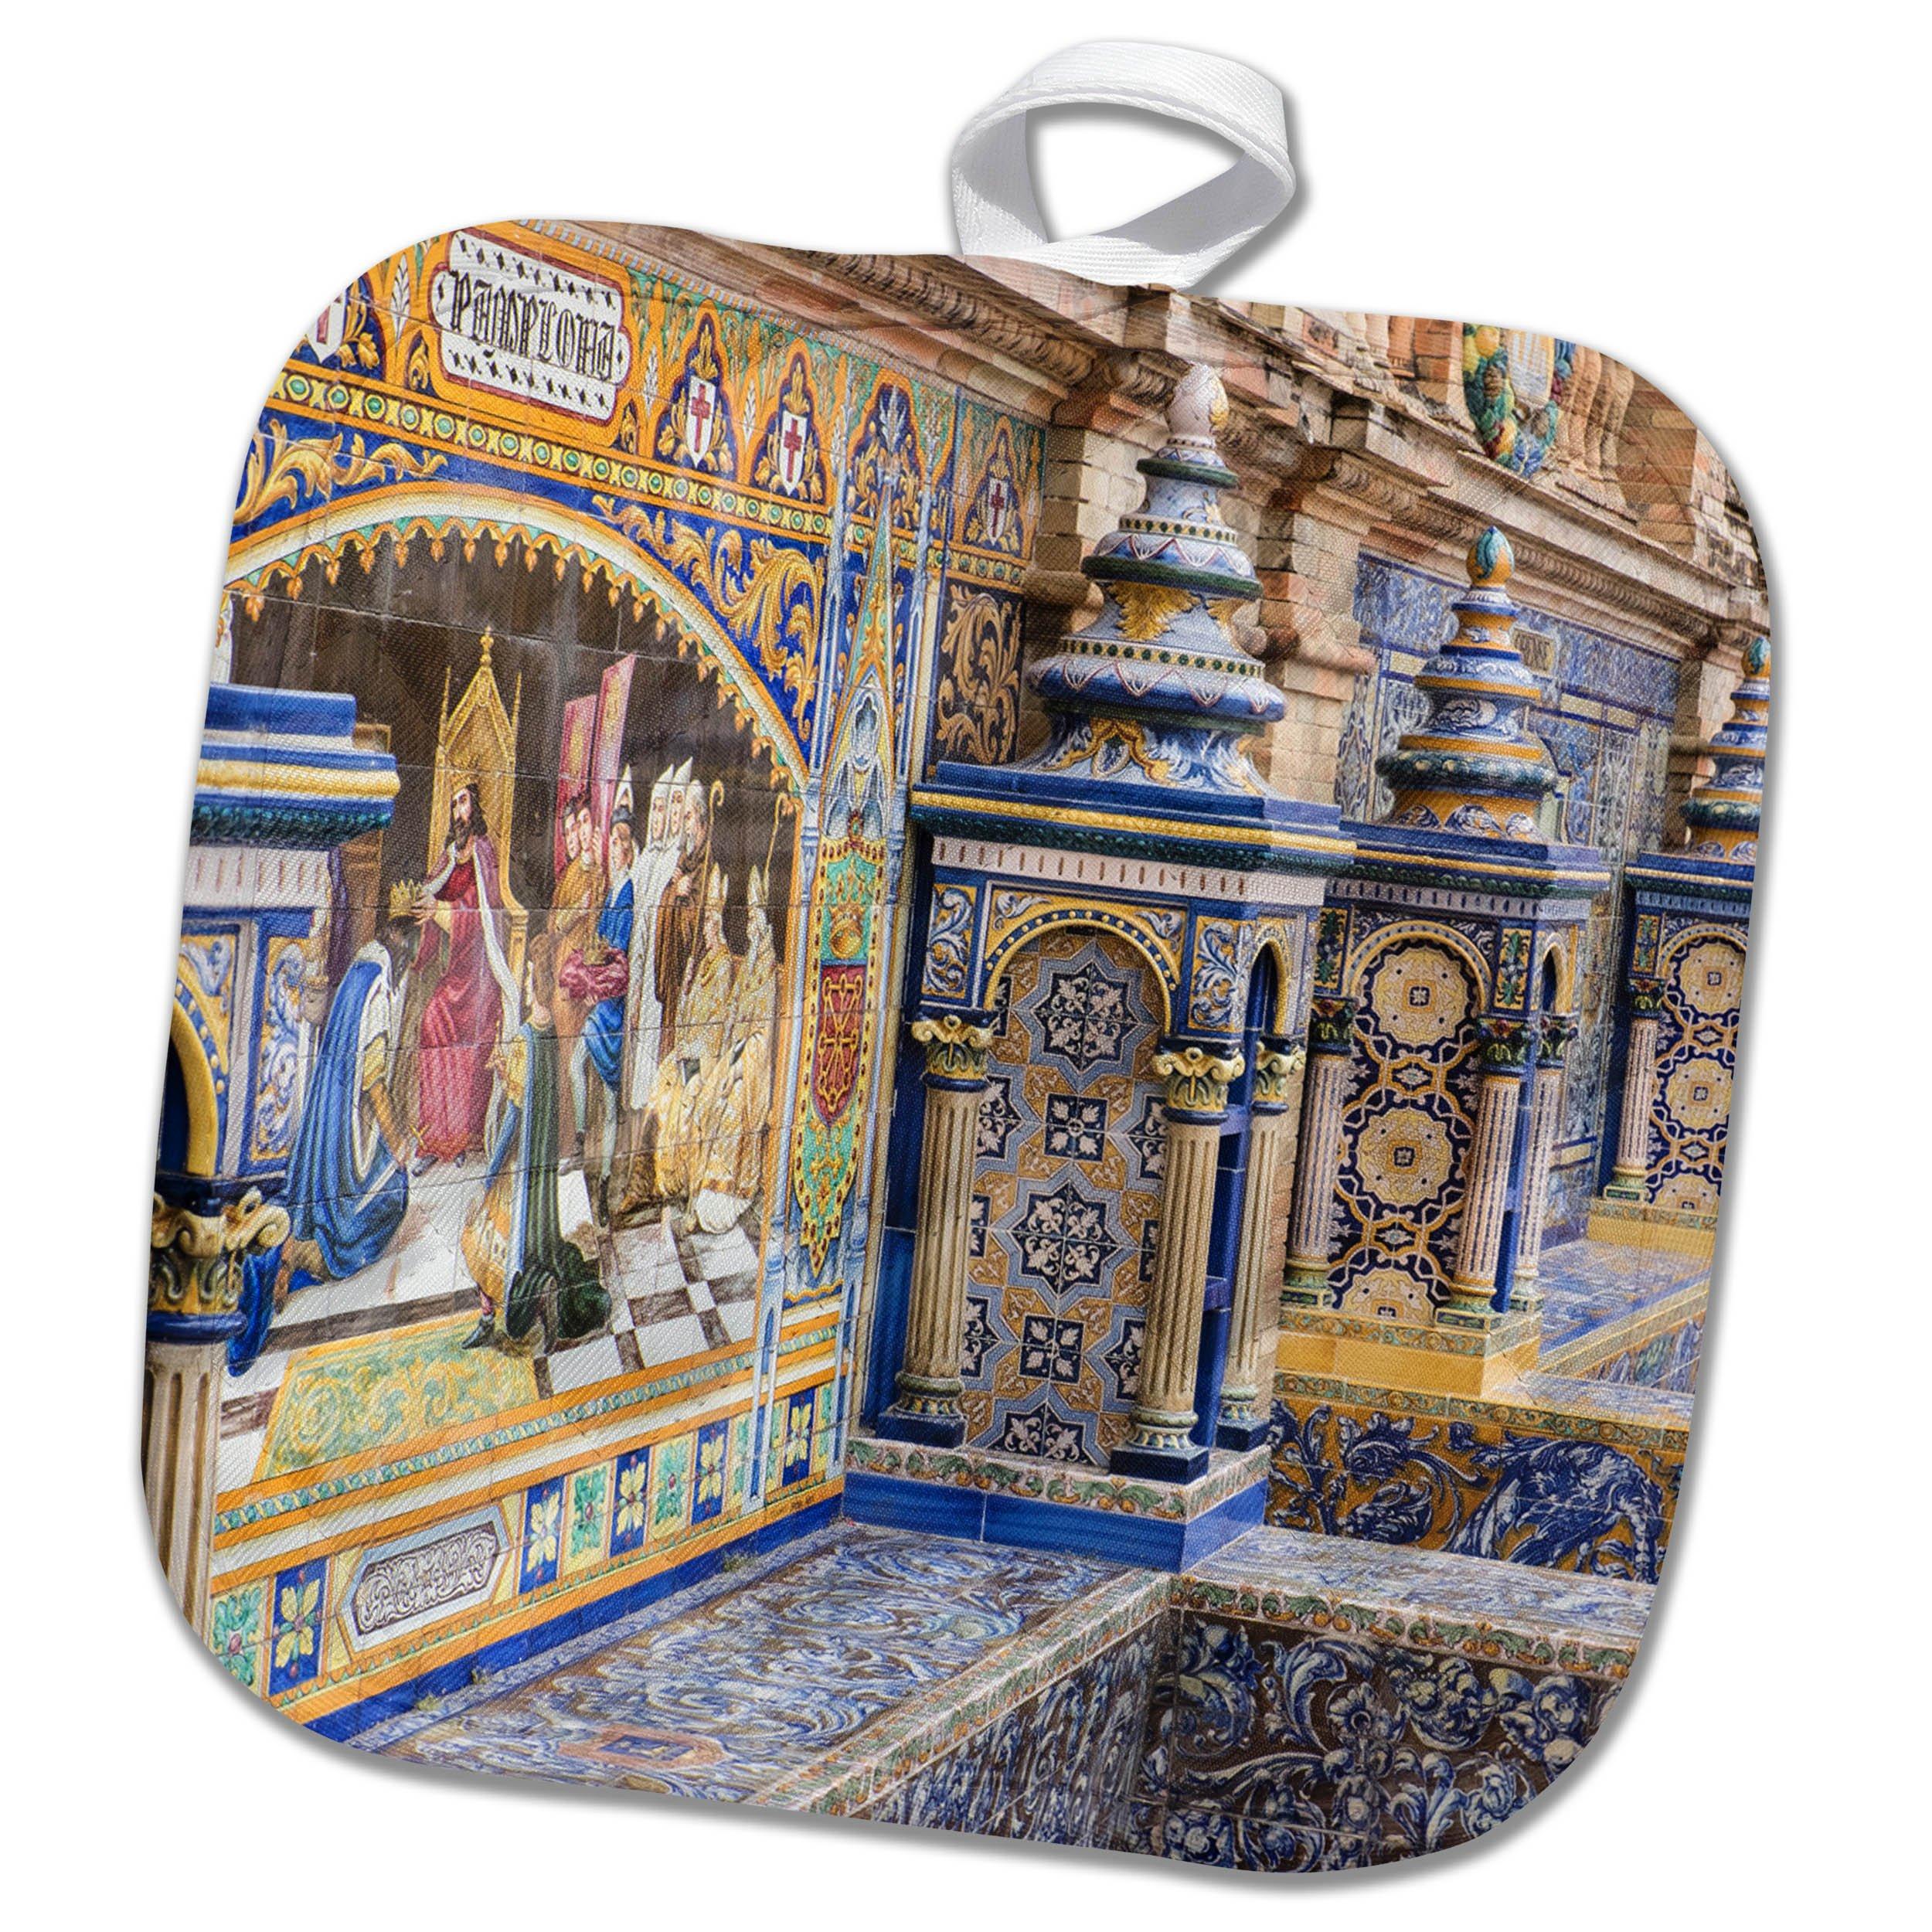 3dRose Danita Delimont - Spain - Spain, Andalusia, Seville. Traditionally decorated Plaza de Espana - 8x8 Potholder (phl_277896_1)